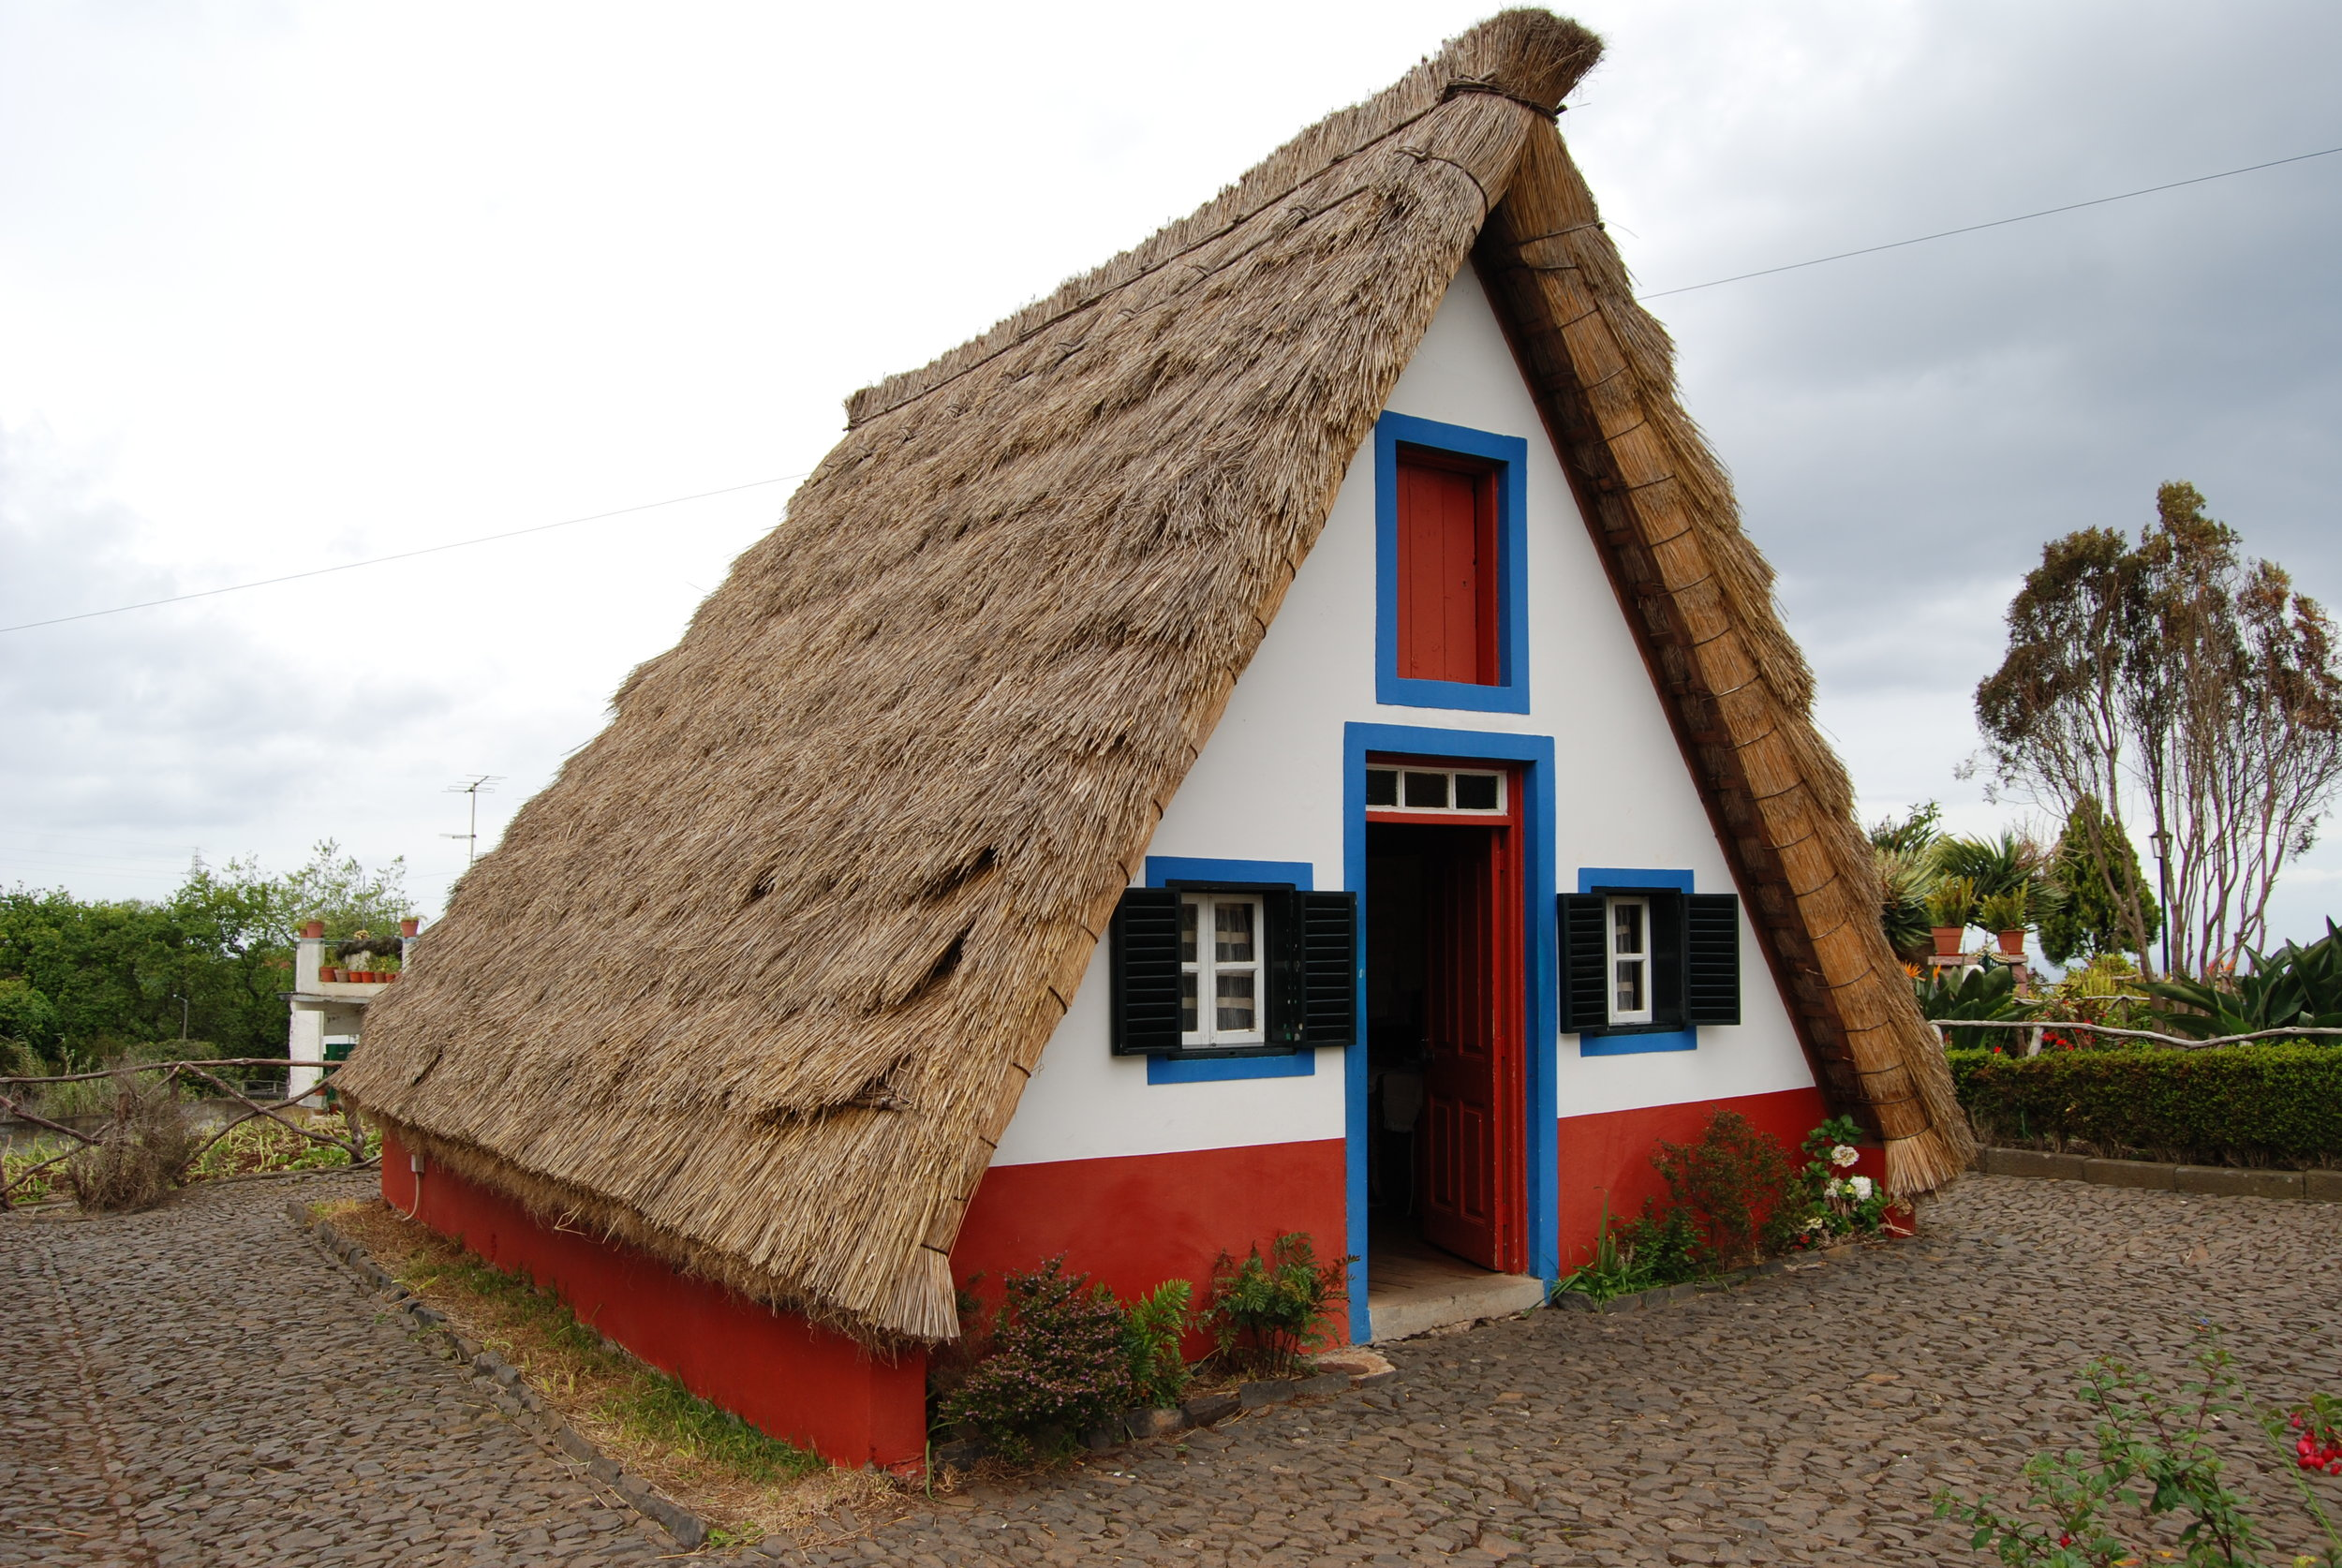 Traditional_thatched_house_(palheiro),_Santana,_Madeira,_Portugal_CC.jpg